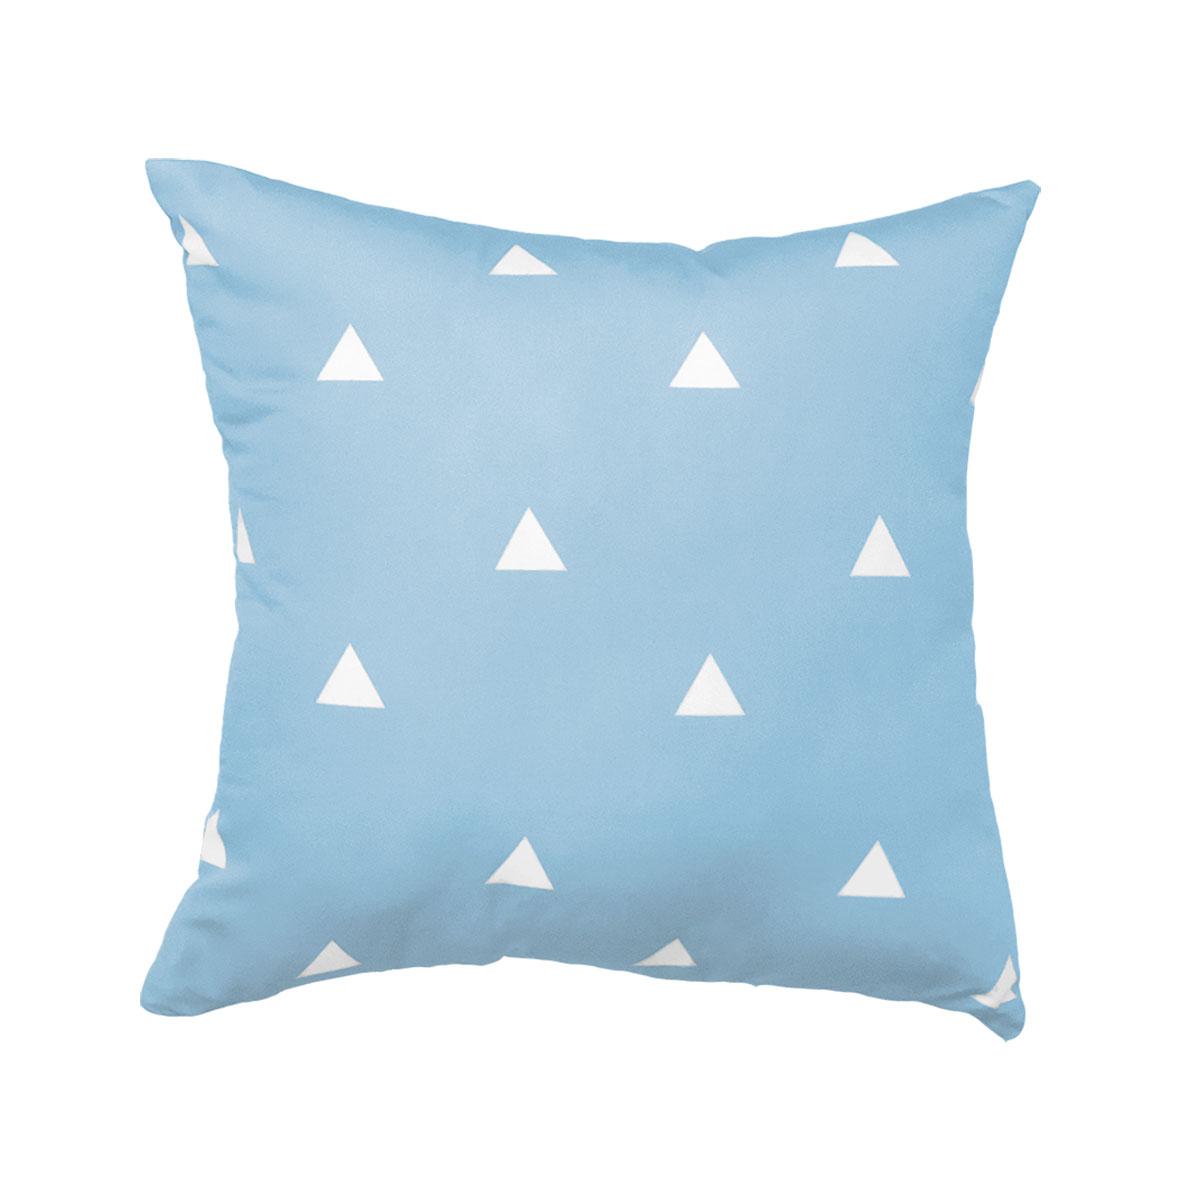 Capa De Almofada Triângulos Brancos Fundo Azul